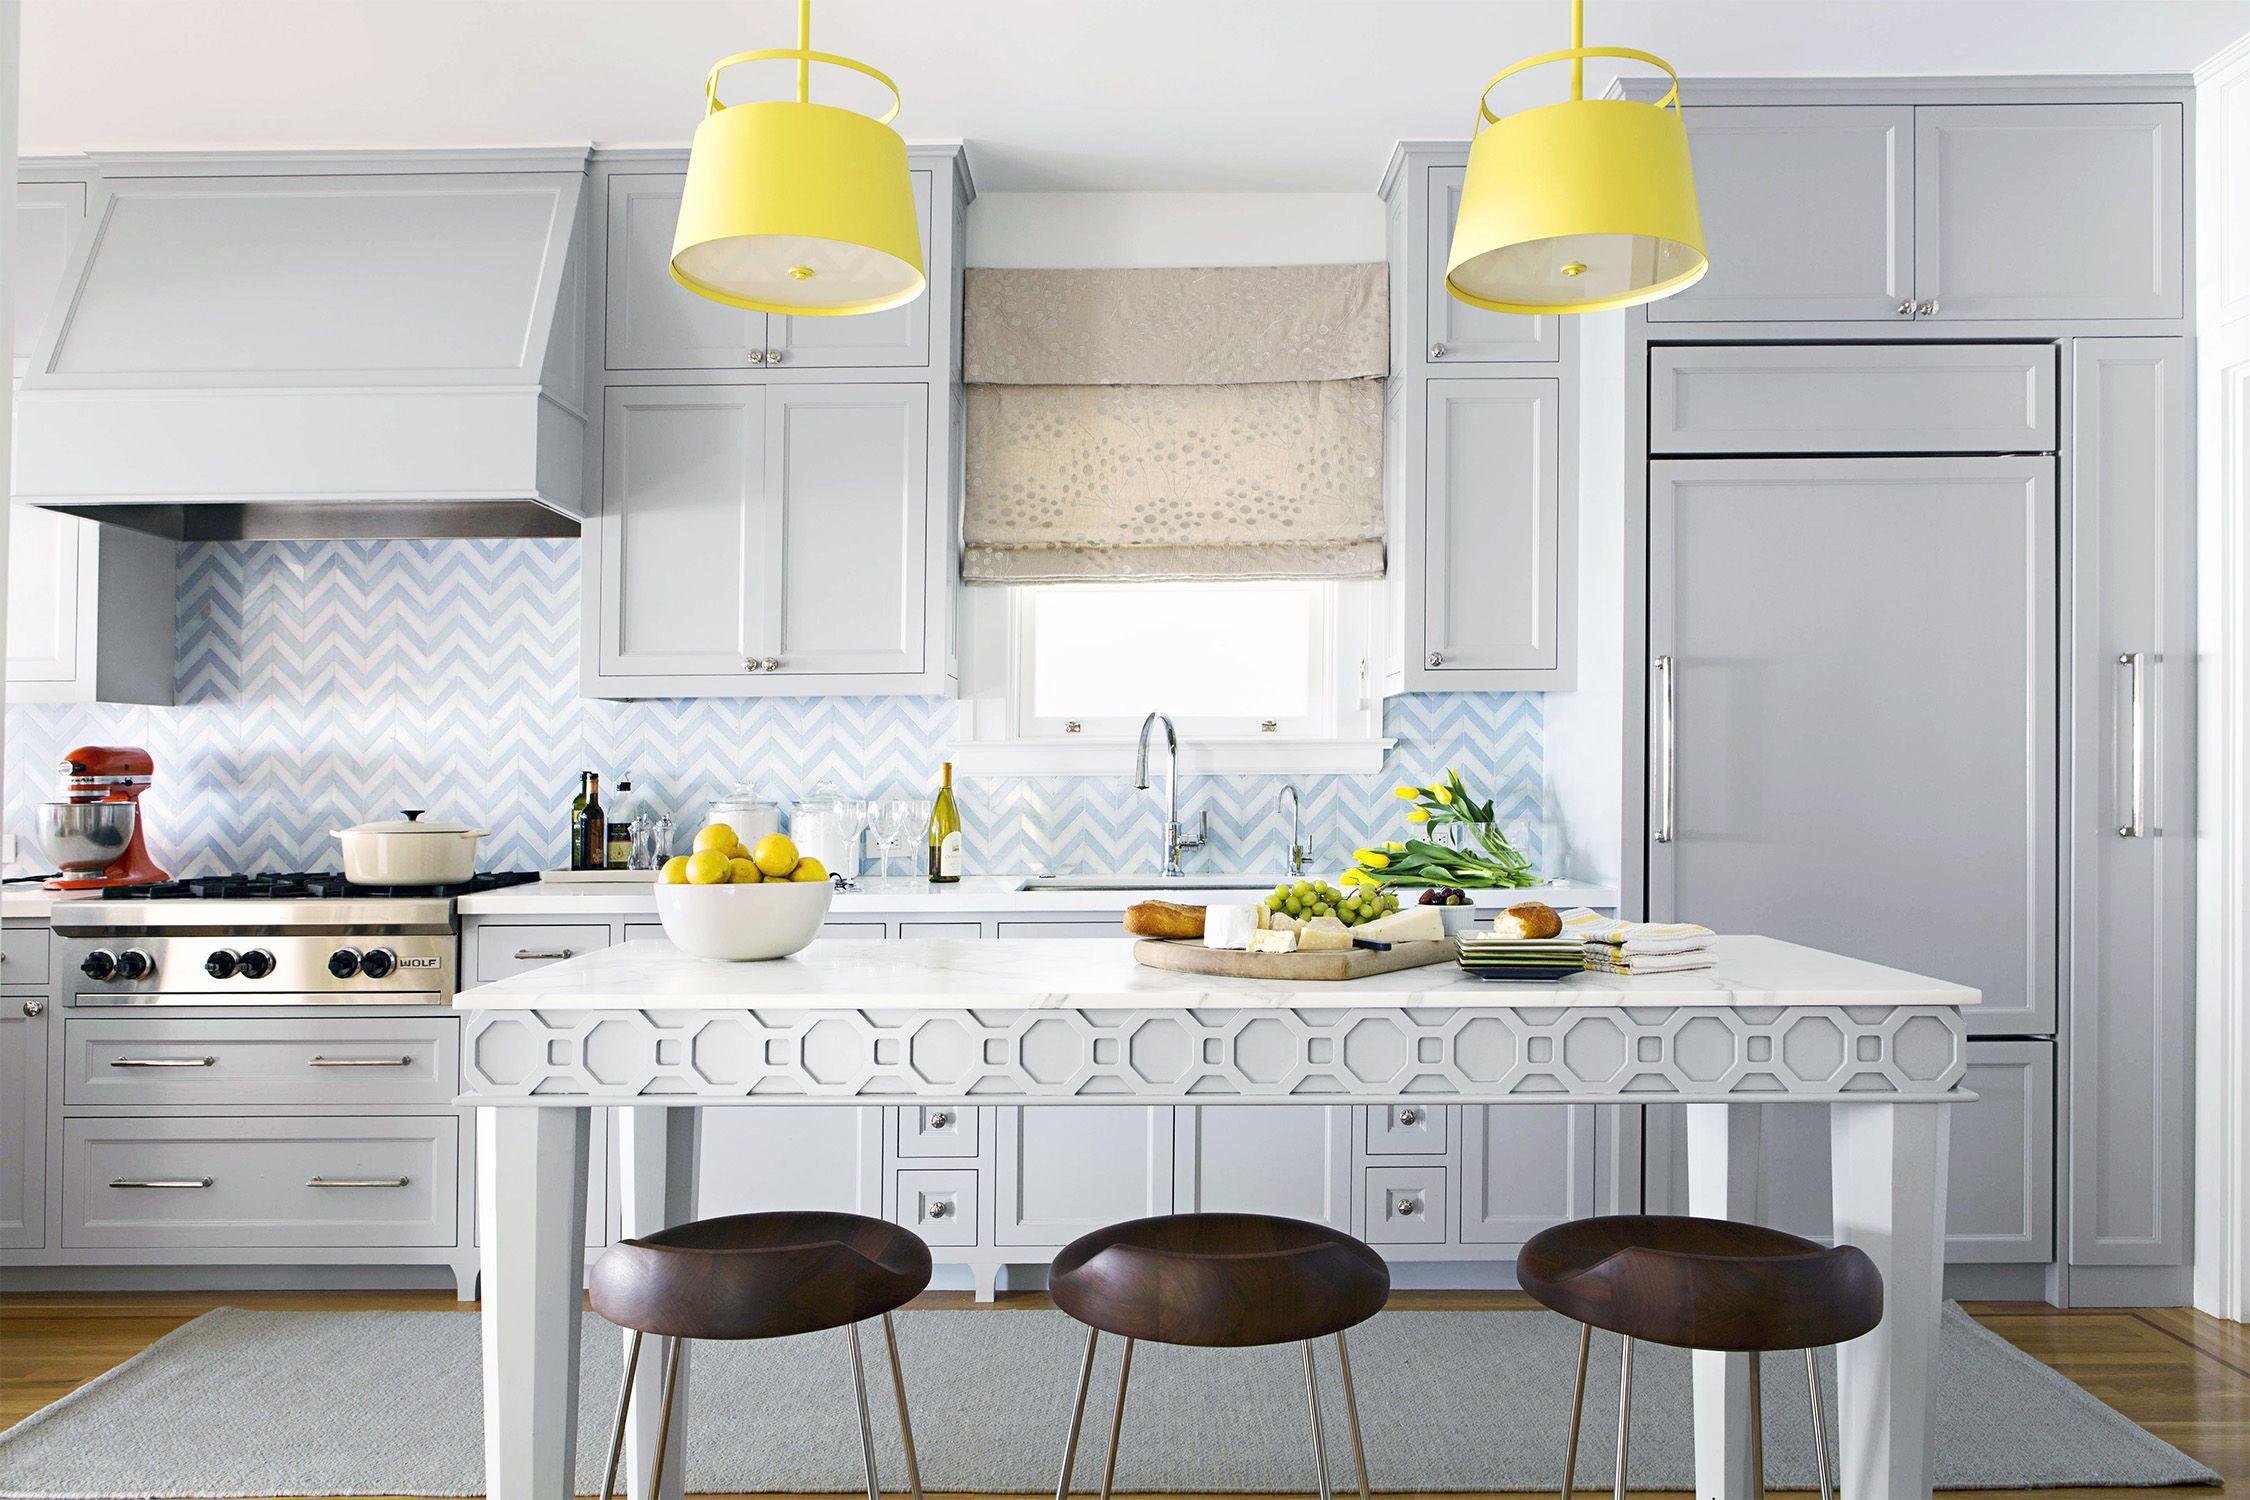 Yellow Kitchen Walls With Black Appliances